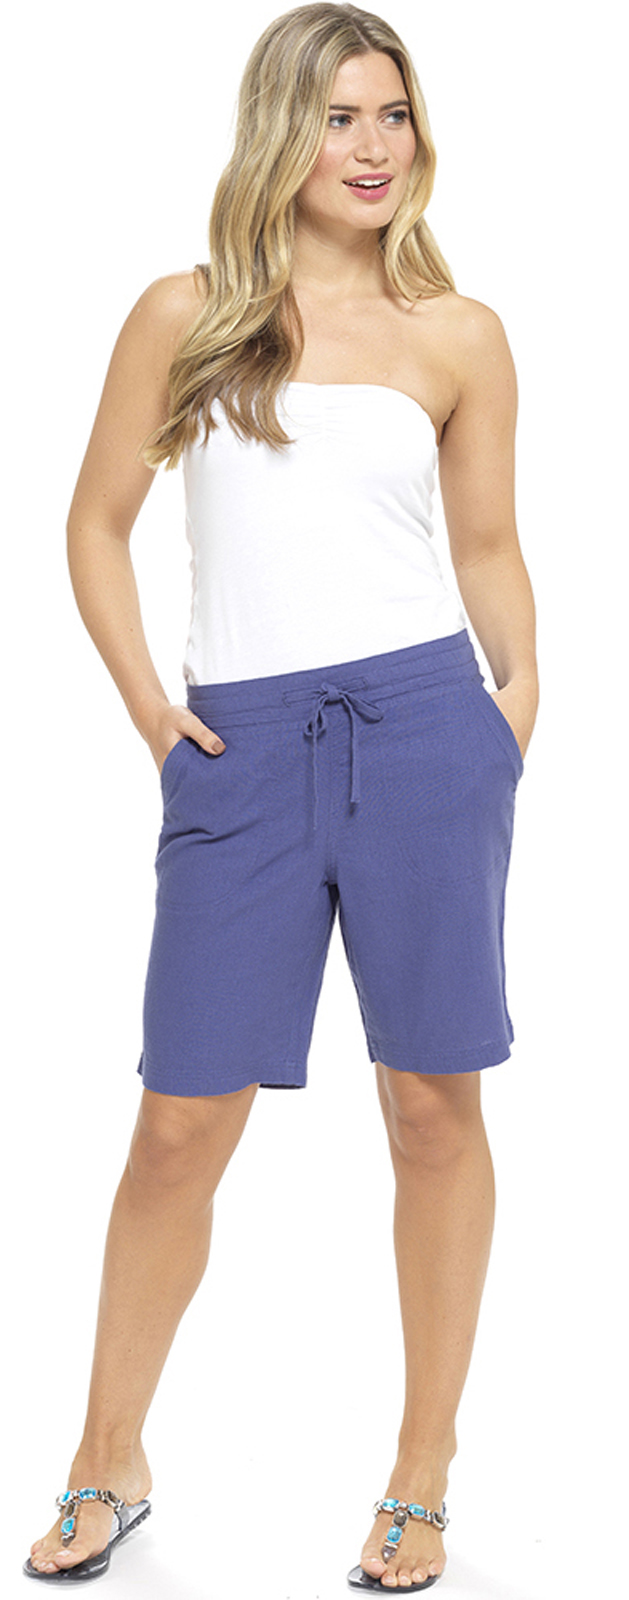 c06d6142cc Womens Linen Shorts With Elasticated Waist Holiday Beach Hot Pants ...